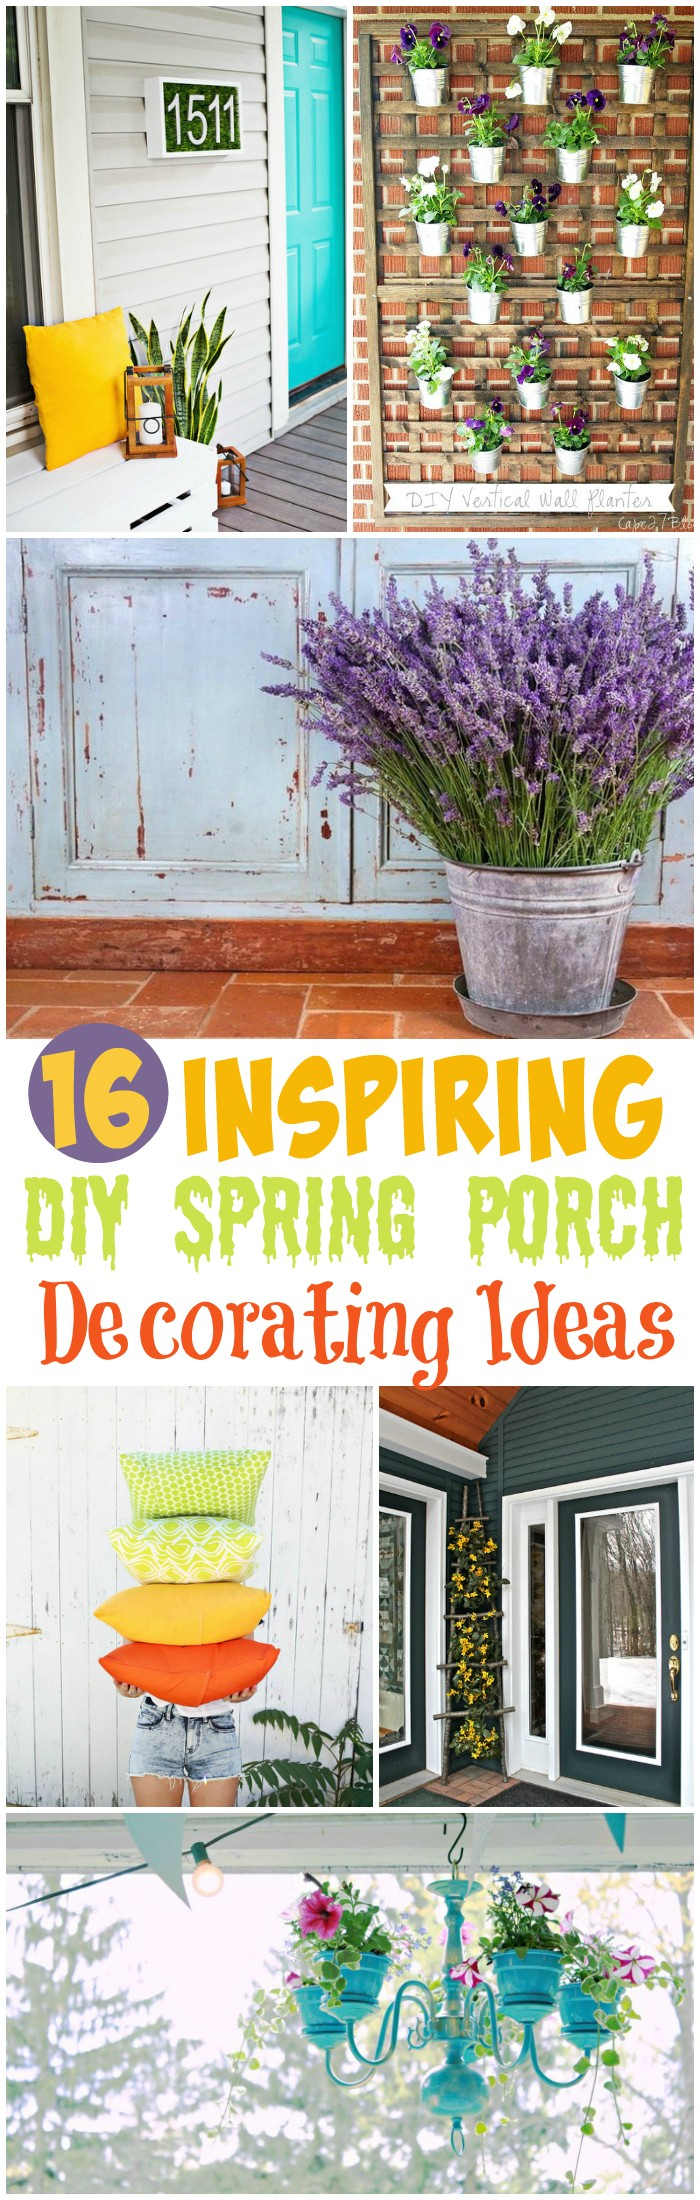 Spring Porch Decorating 16 Inspiring DIY Spring Porch Decorating Ideas